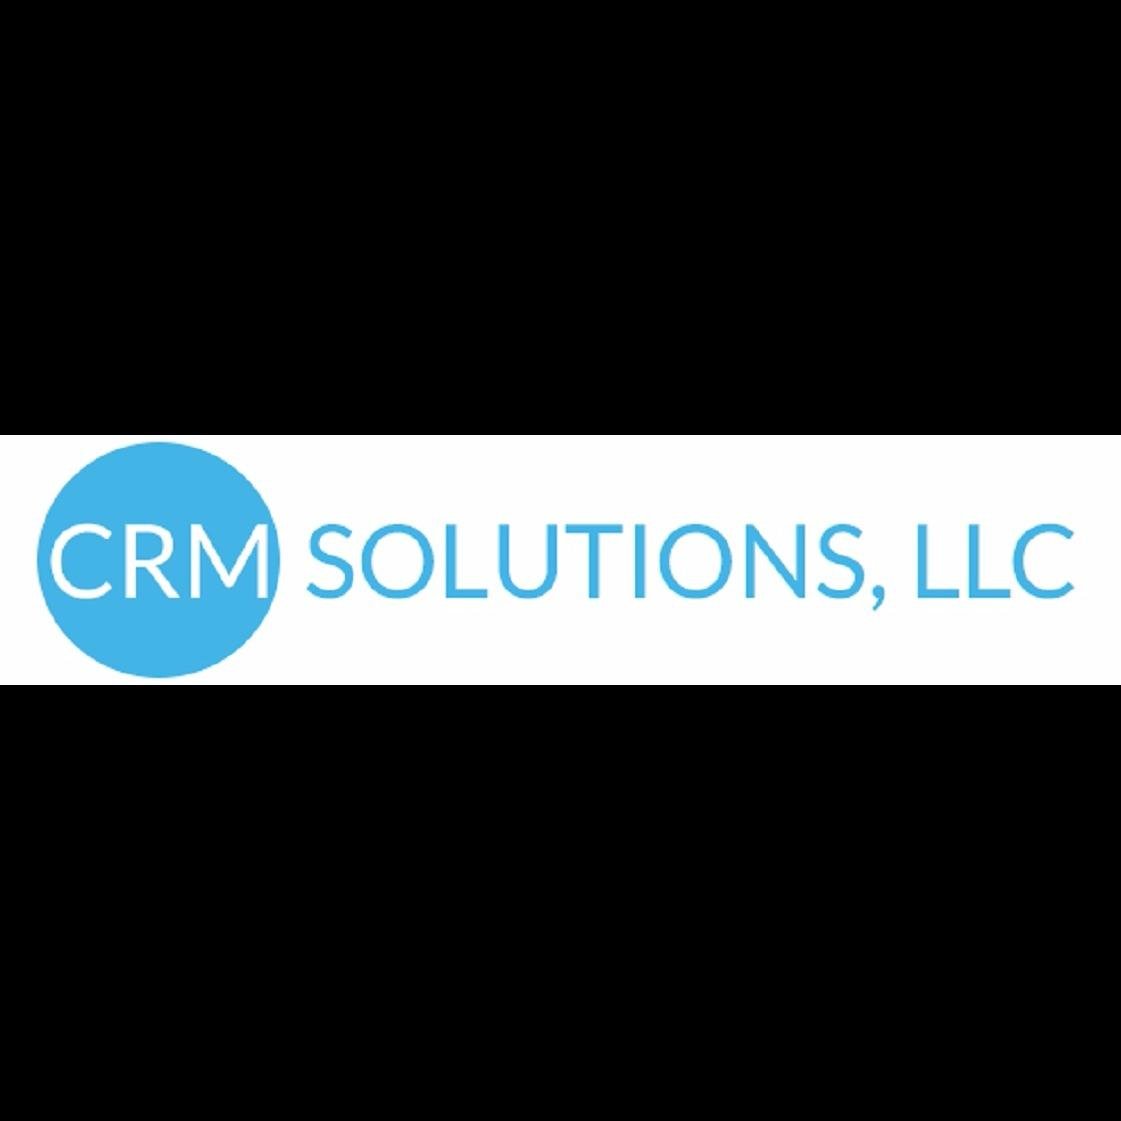 CRM Solutions, LLC